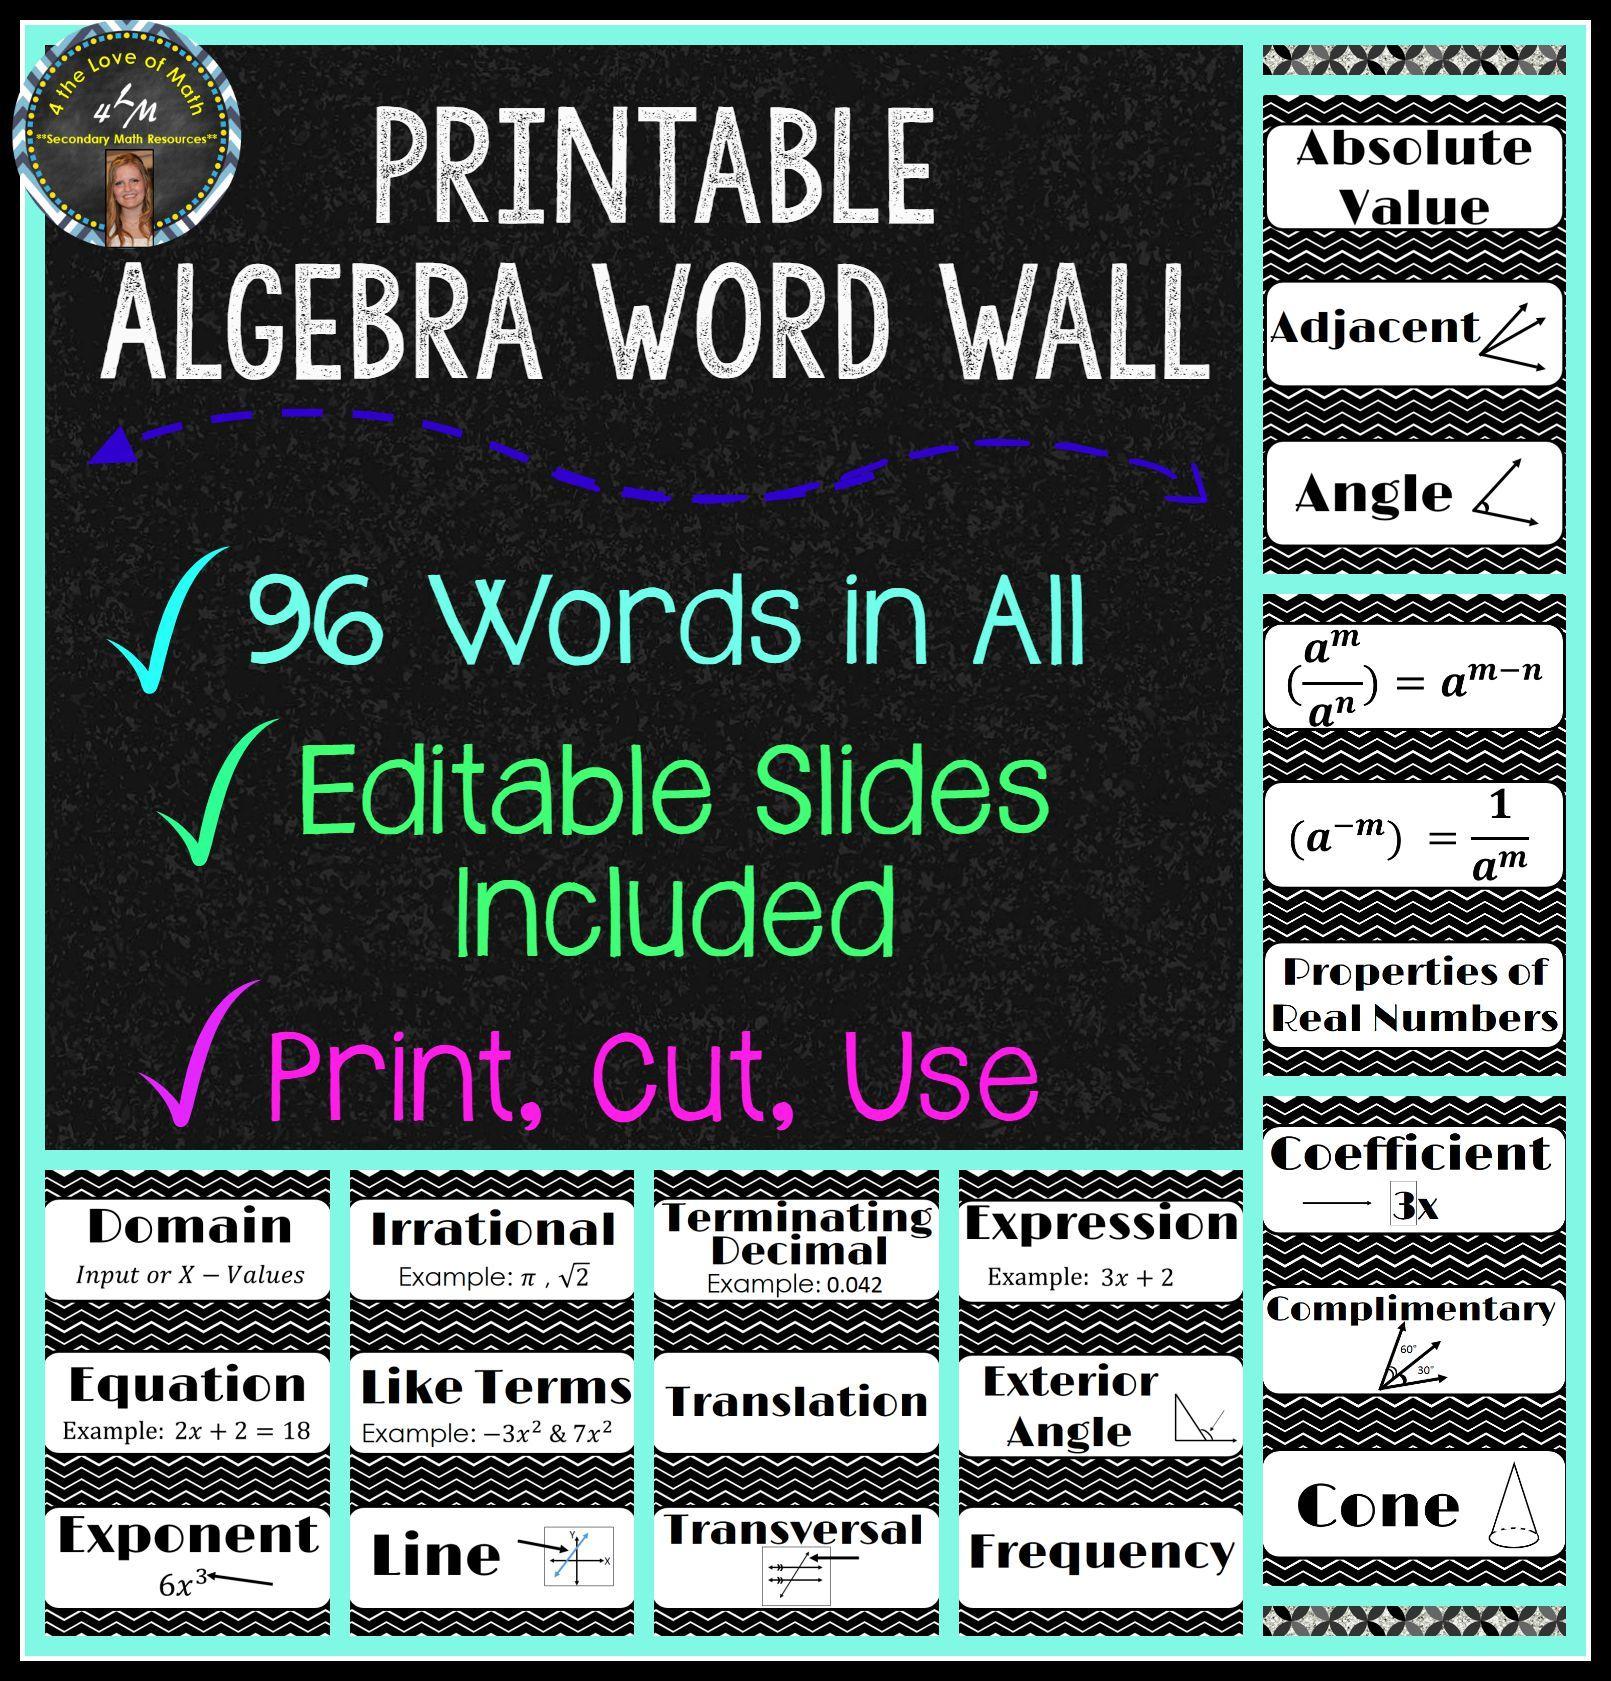 algebra word wall strips 96 in all math word walls on word wall id=22216